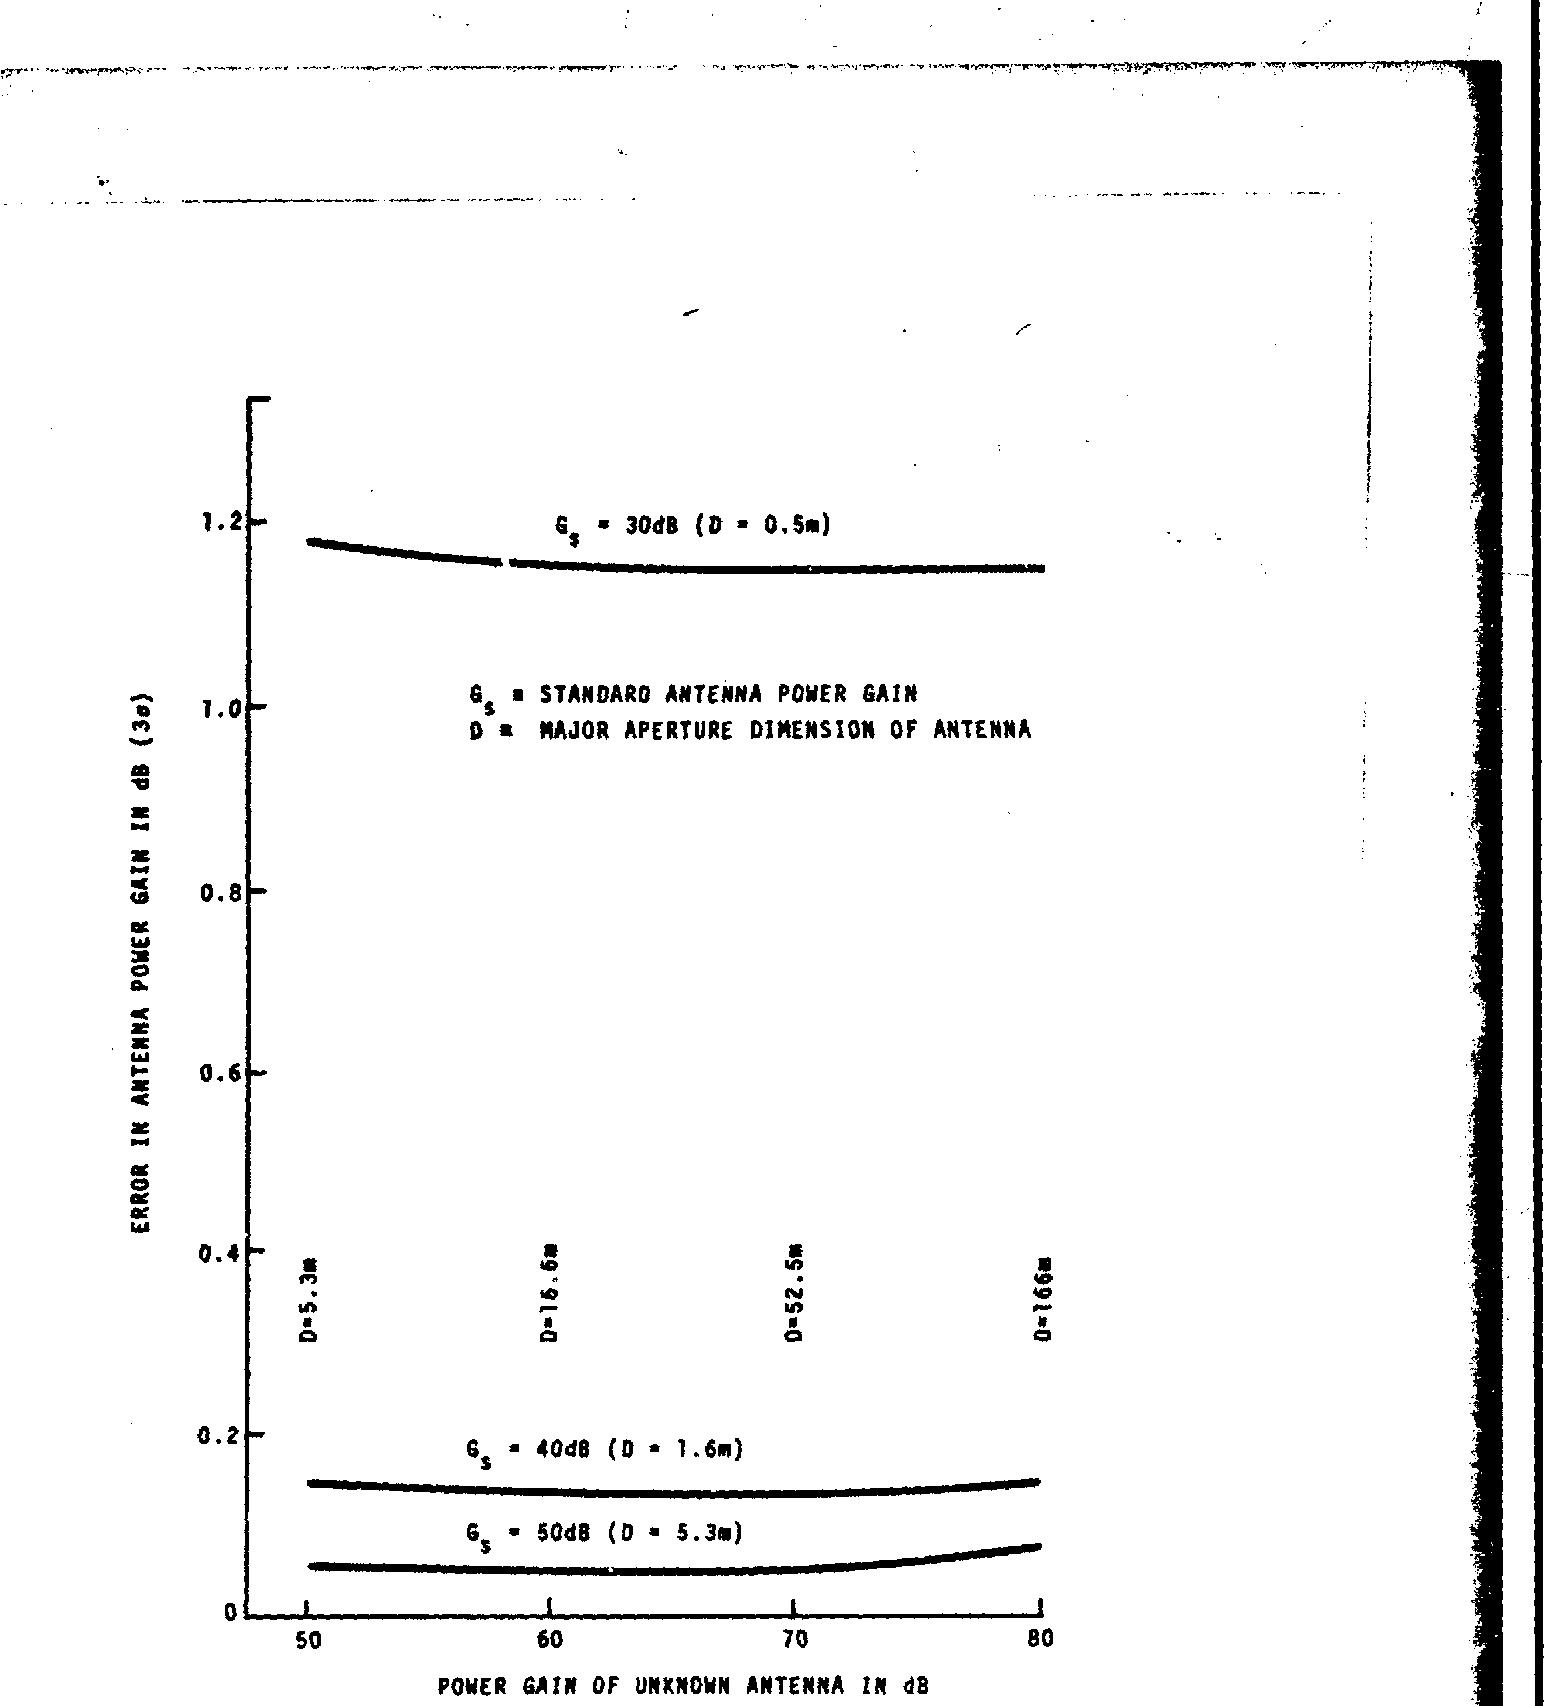 figure 4-25